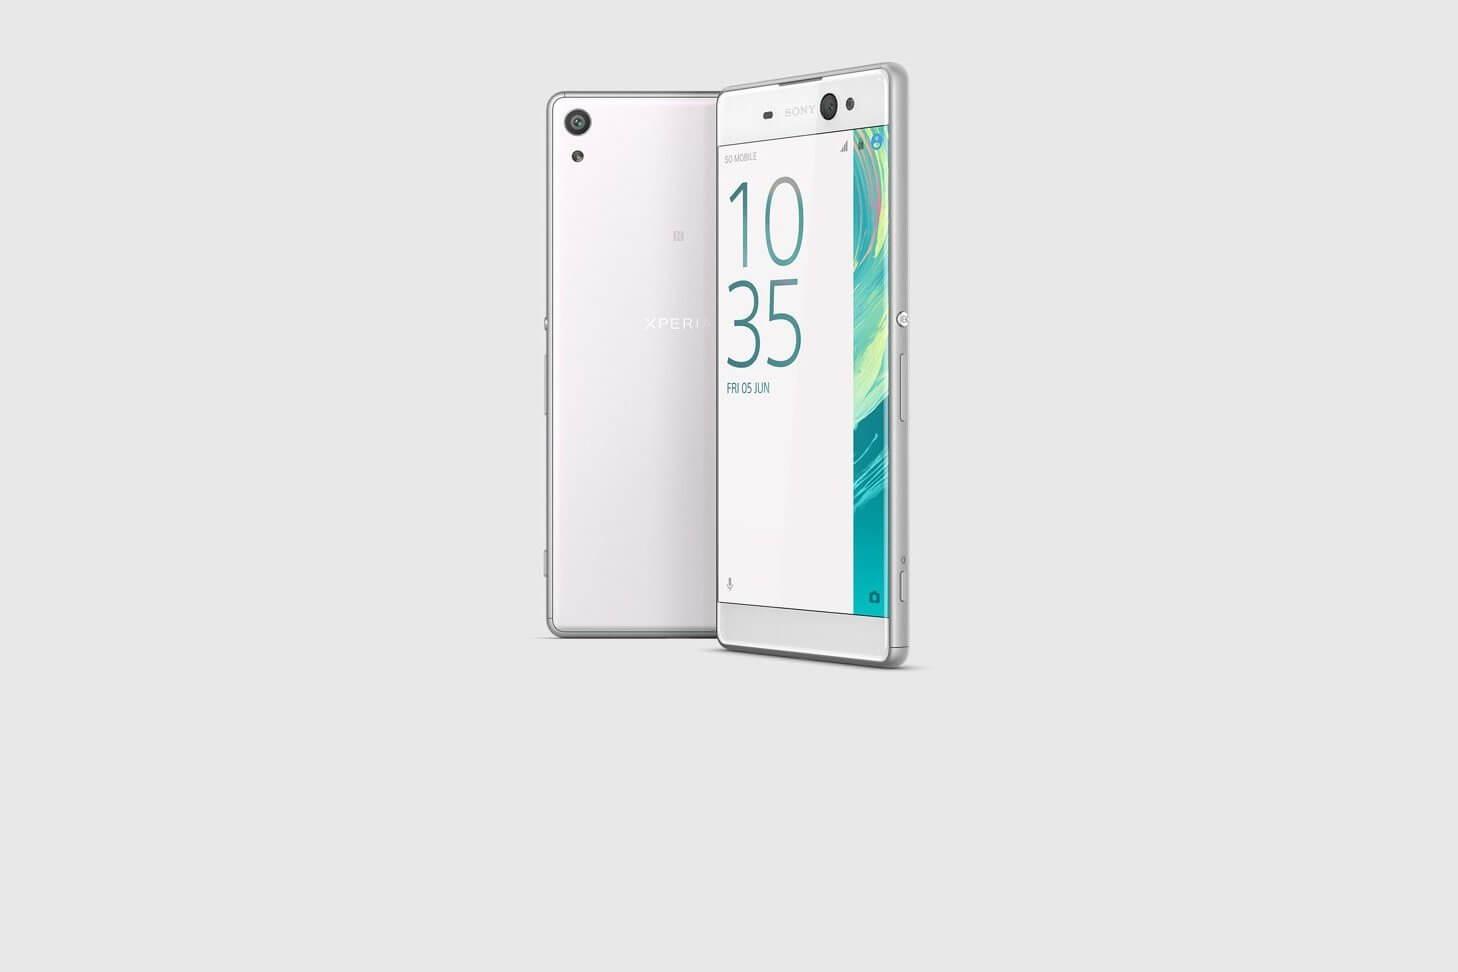 smt sony xperia xa ultra p01 - Sony apresenta Xperia XA Ultra, seu phablet bom de selfie